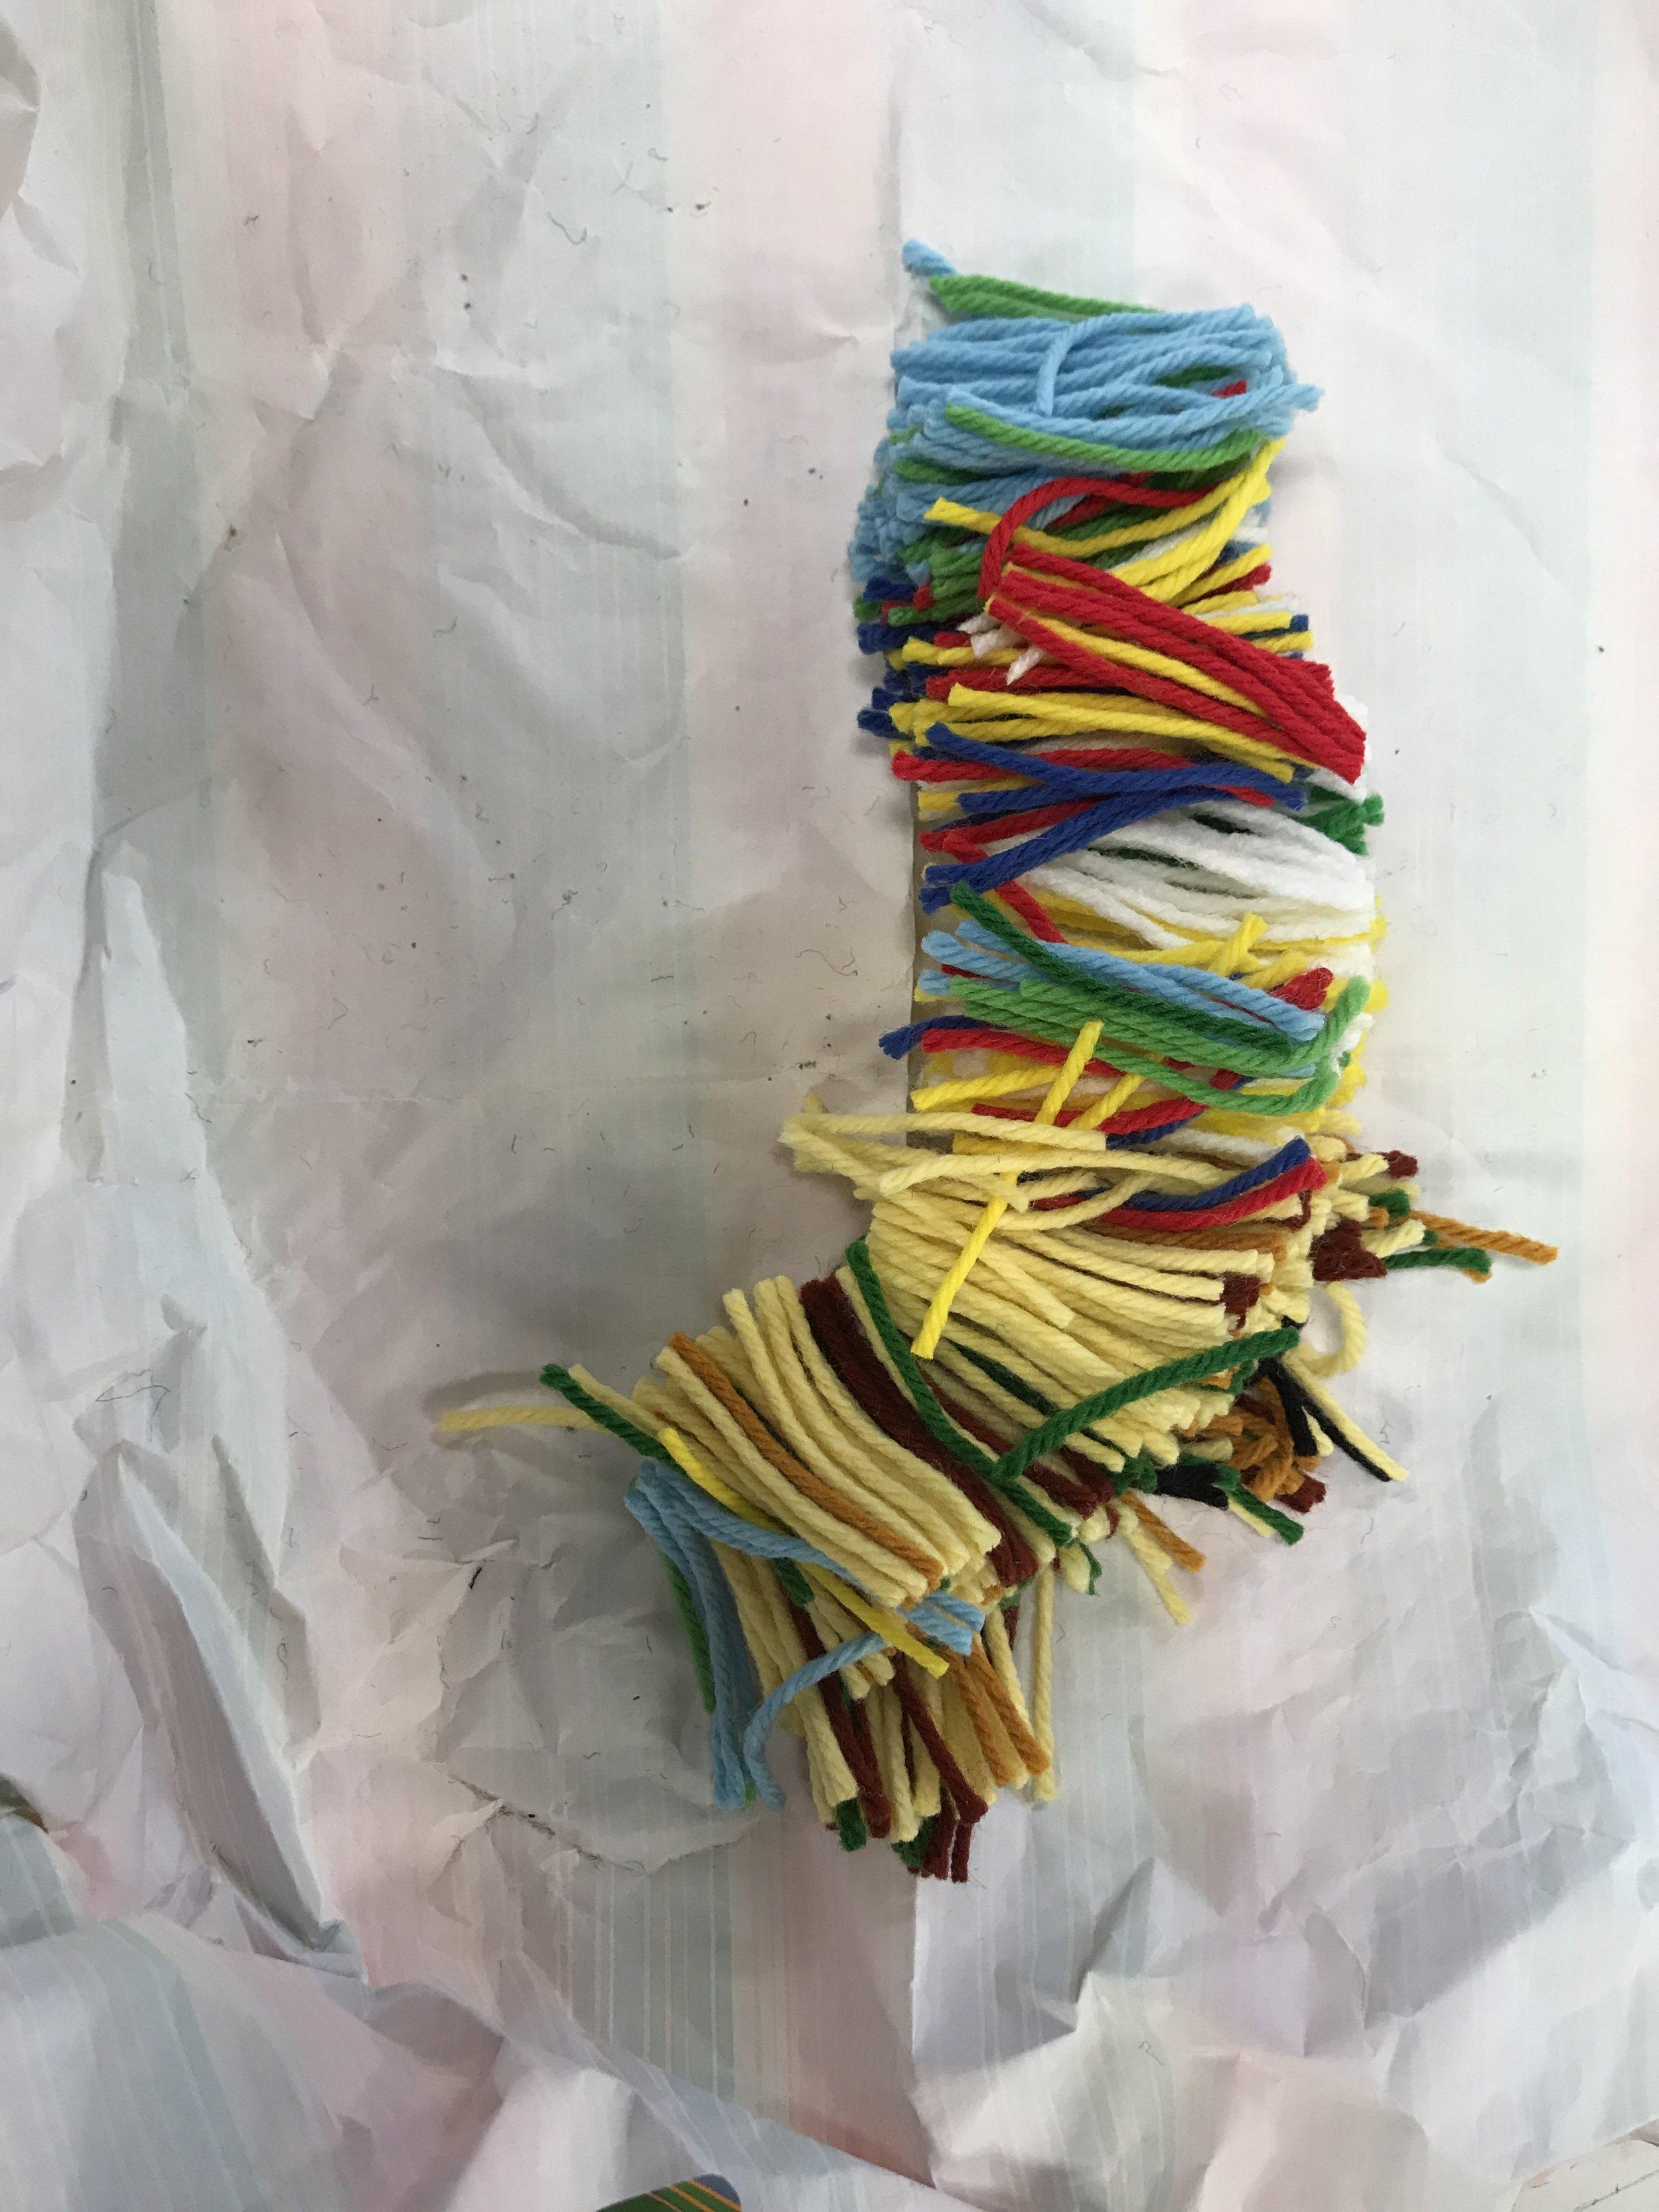 gift 2. a bag full of yarn scraps used for rug hooks.